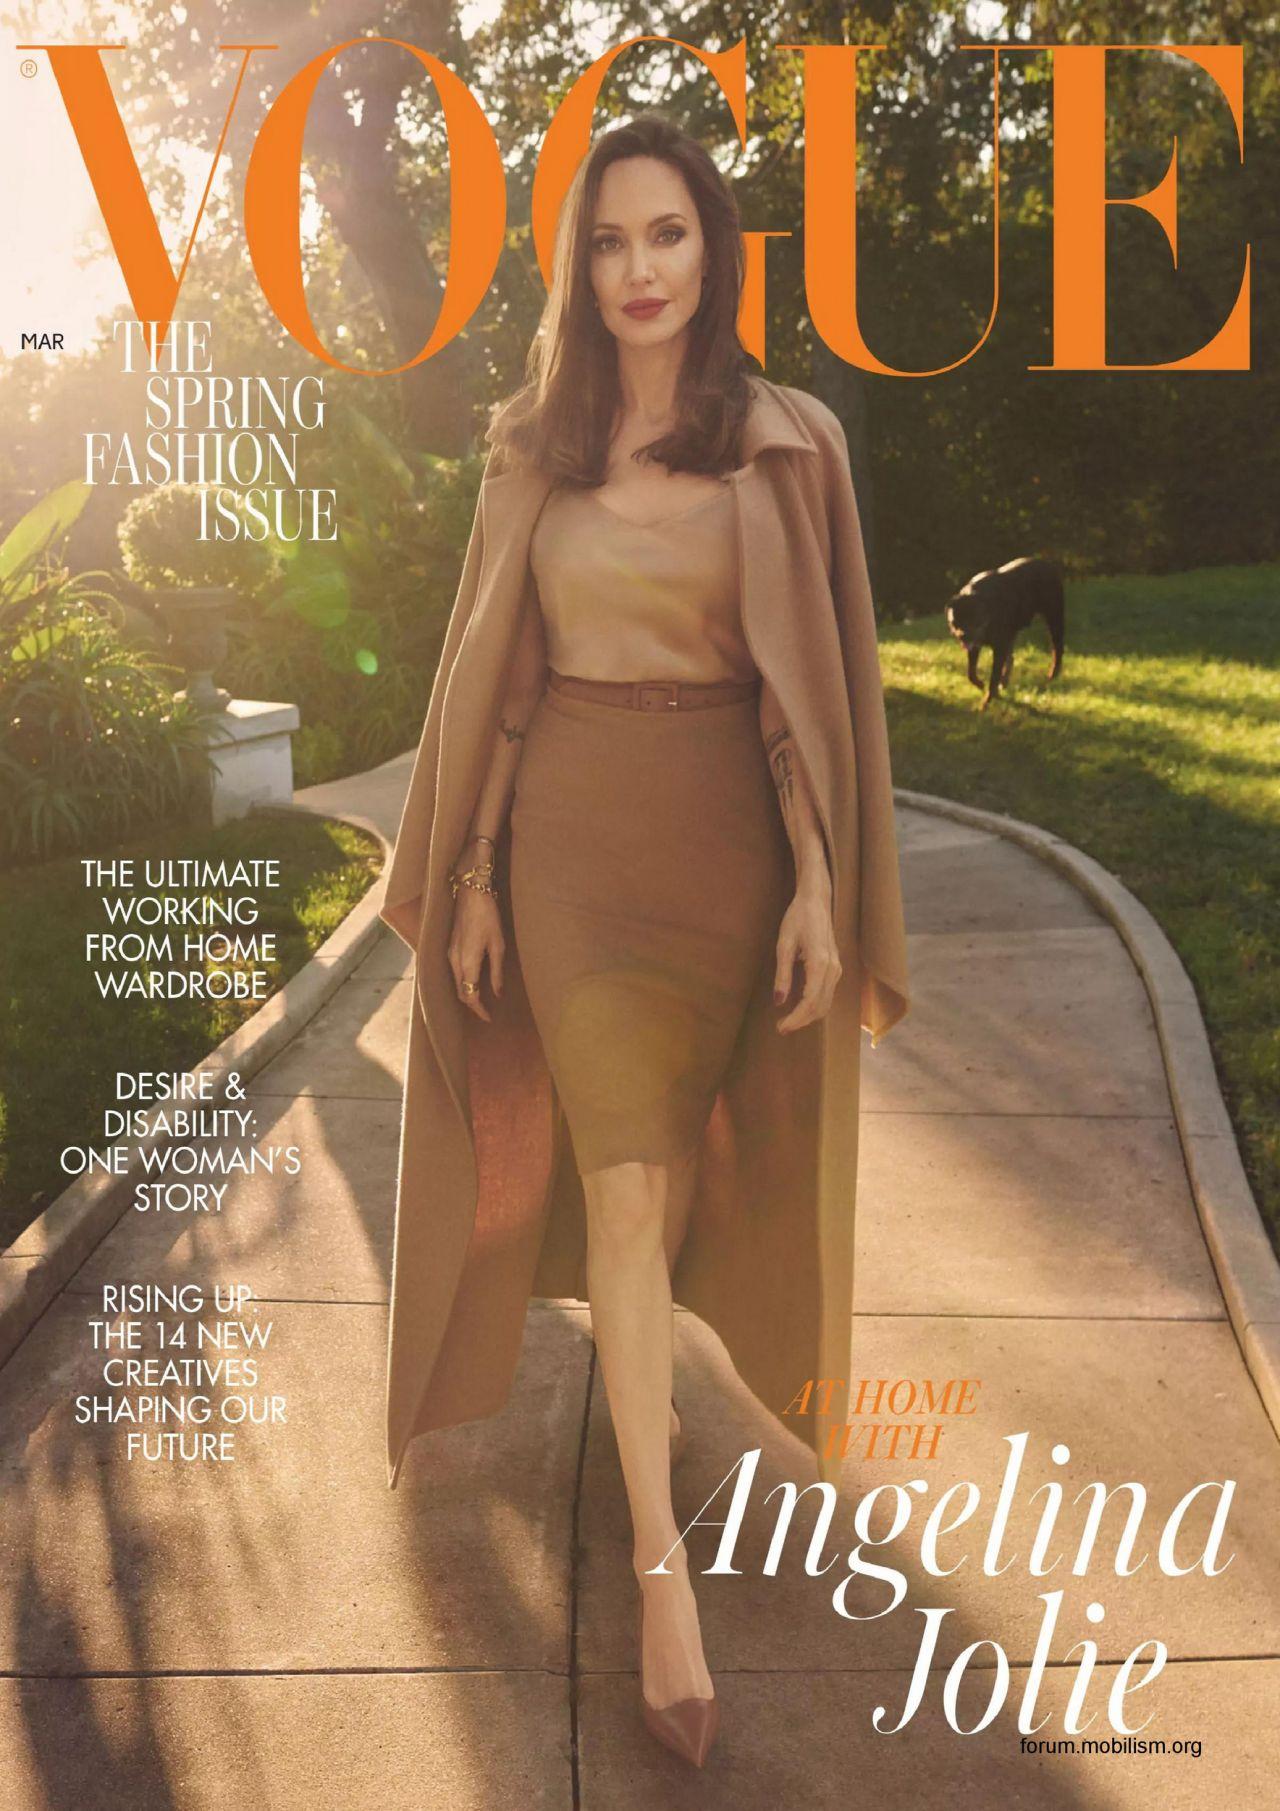 Angelina Jolie - Vogue UK March 2021 Issue • CelebMafia